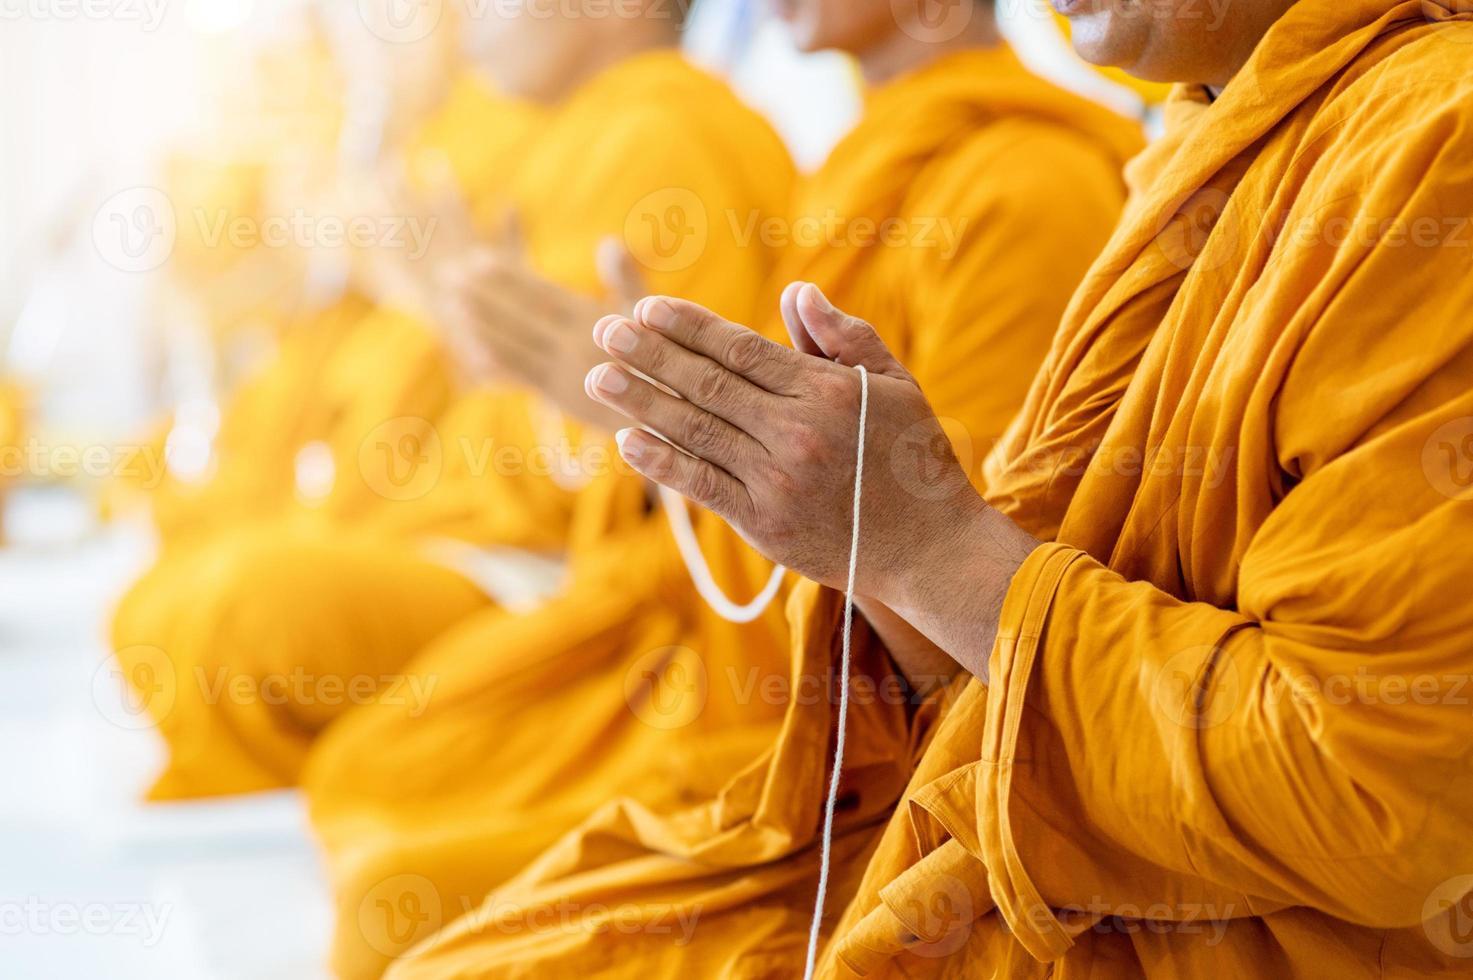 monjes budistas cantan rituales budistas foto